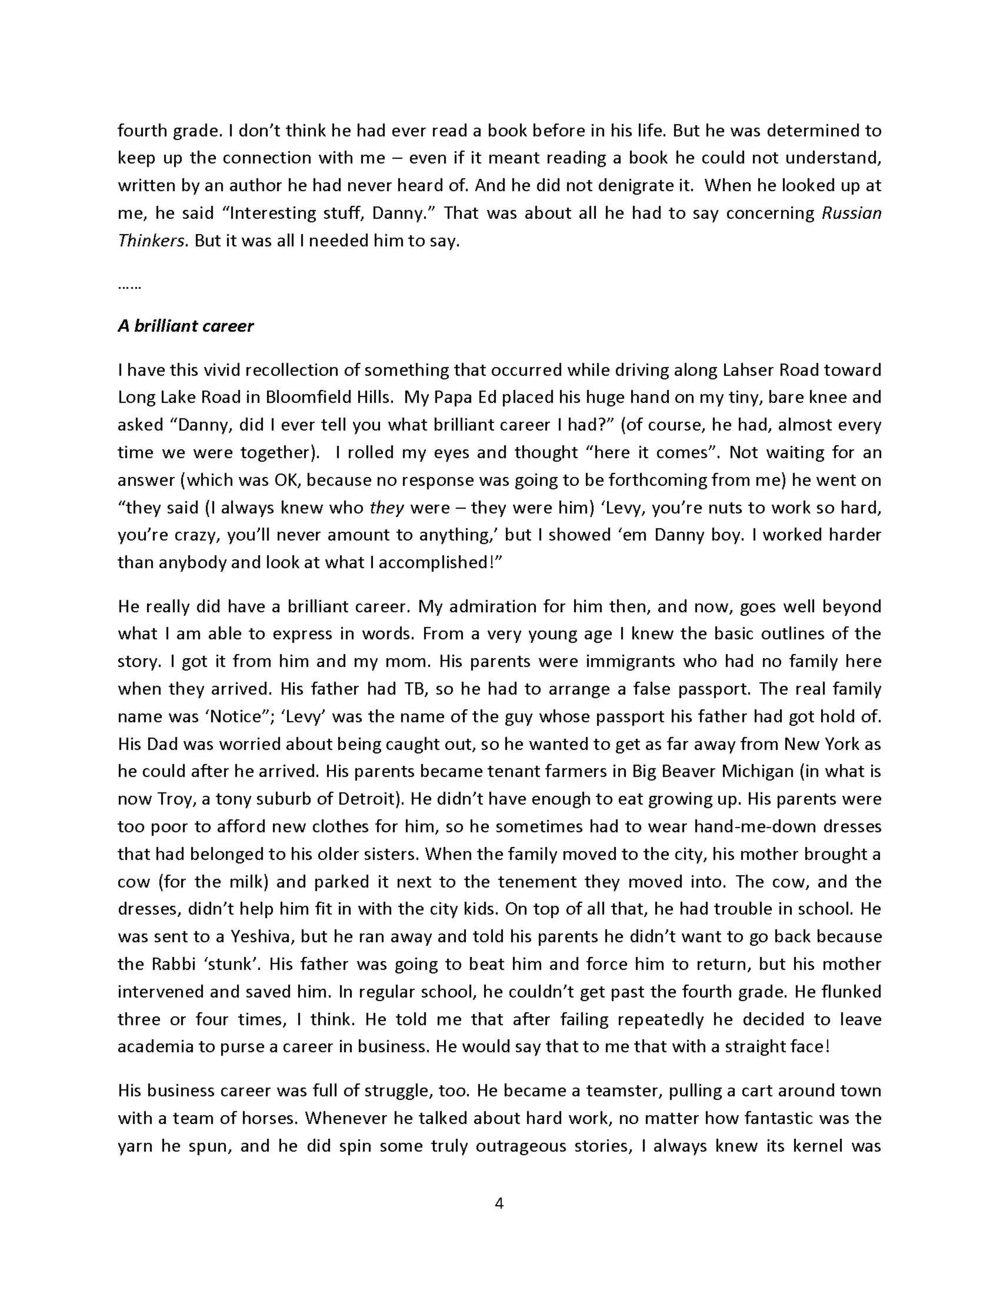 Papa Ed Stories -excerpts_Page_04.jpg